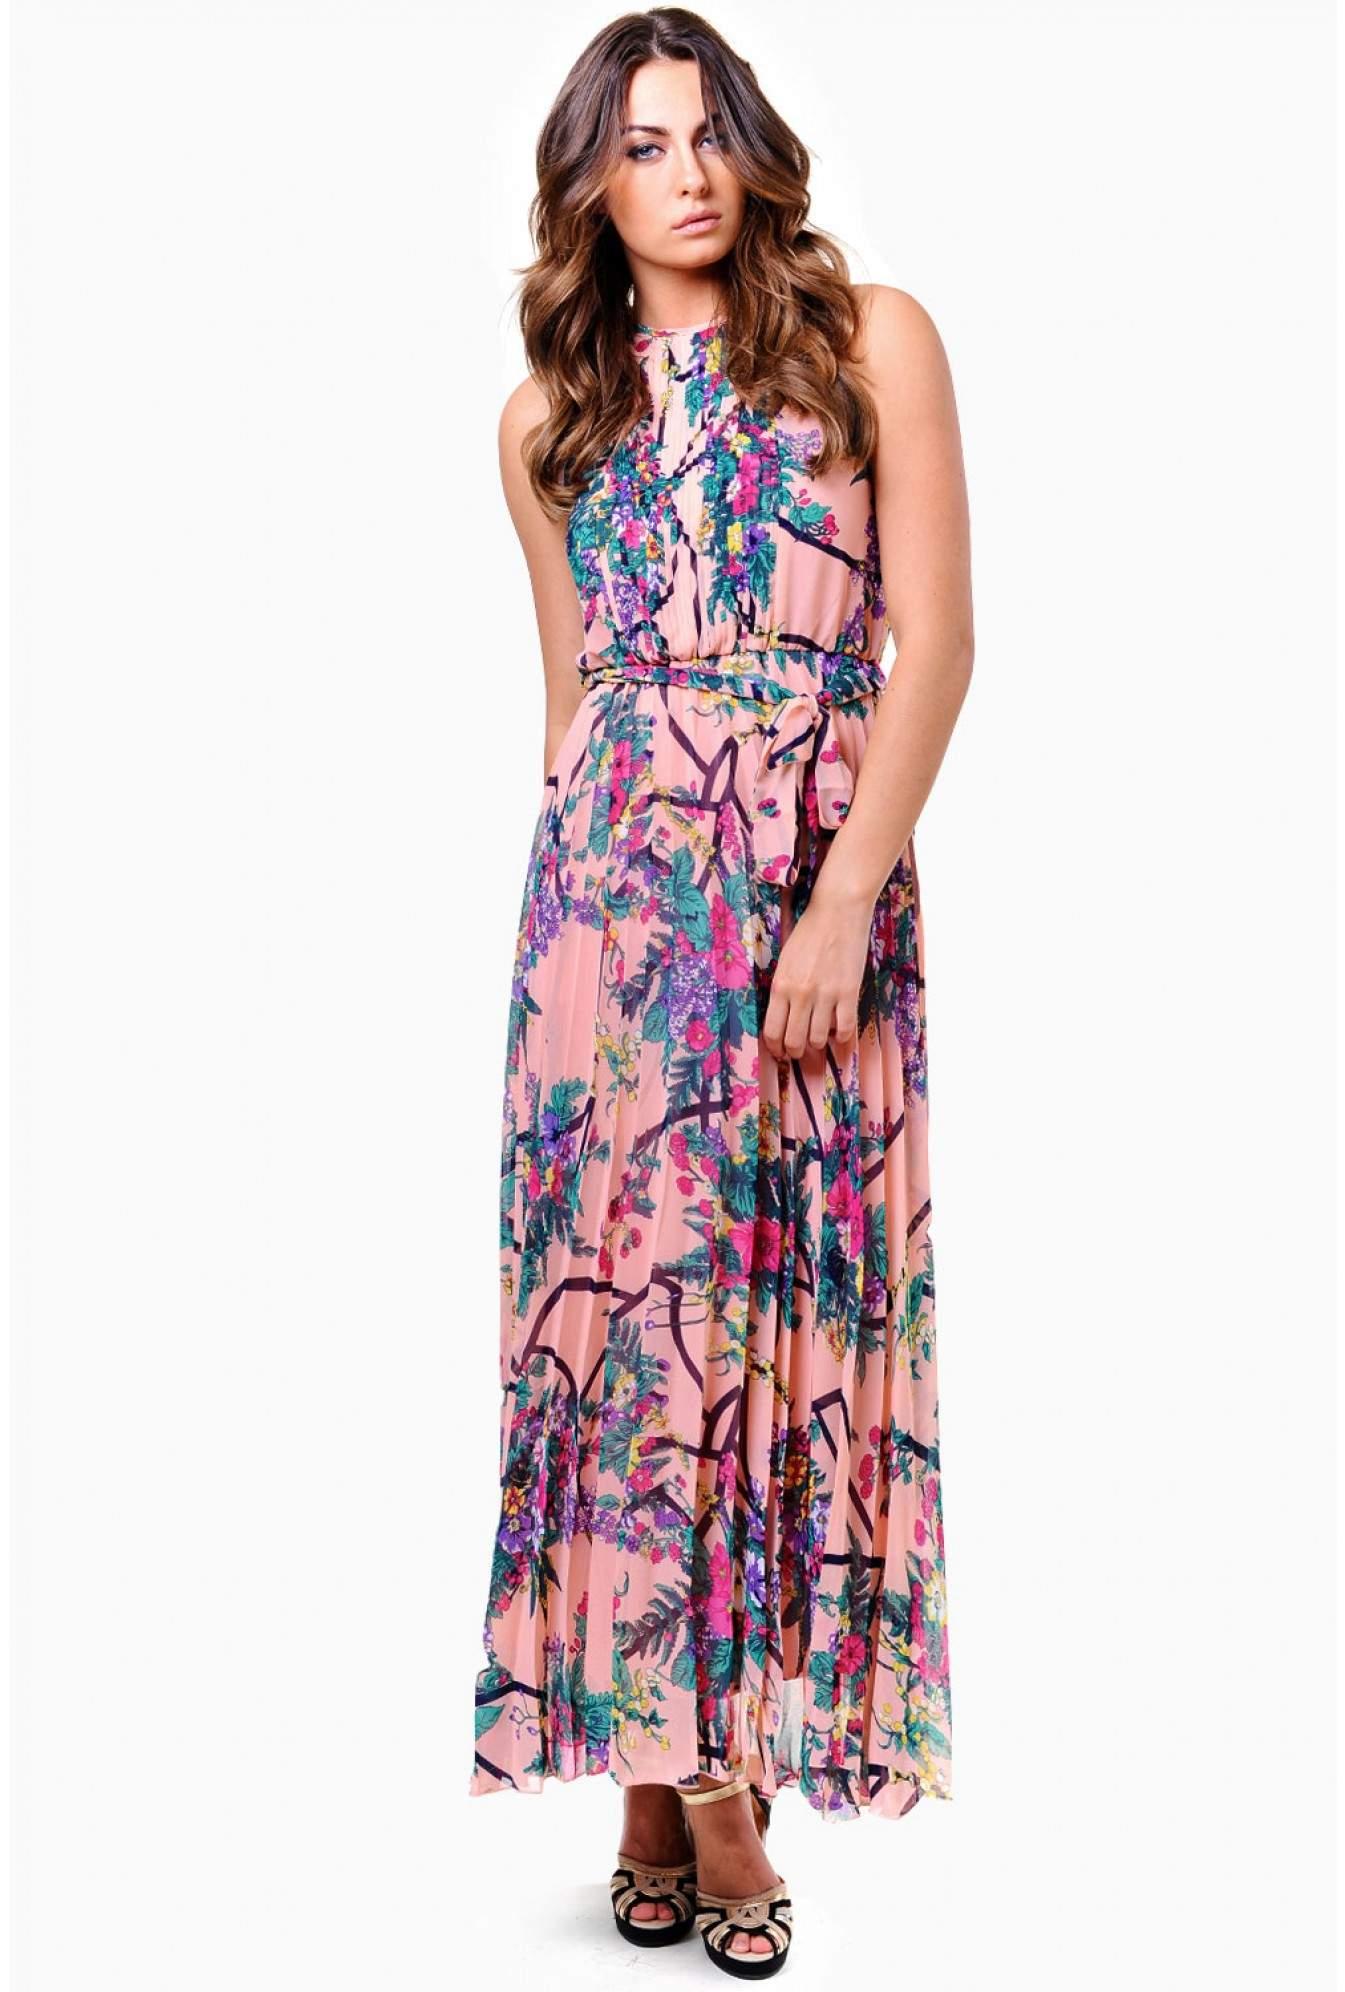 Aqua Womens B//W Floral Print Cut-Out Sleeveless Party Dress S BHFO 4491